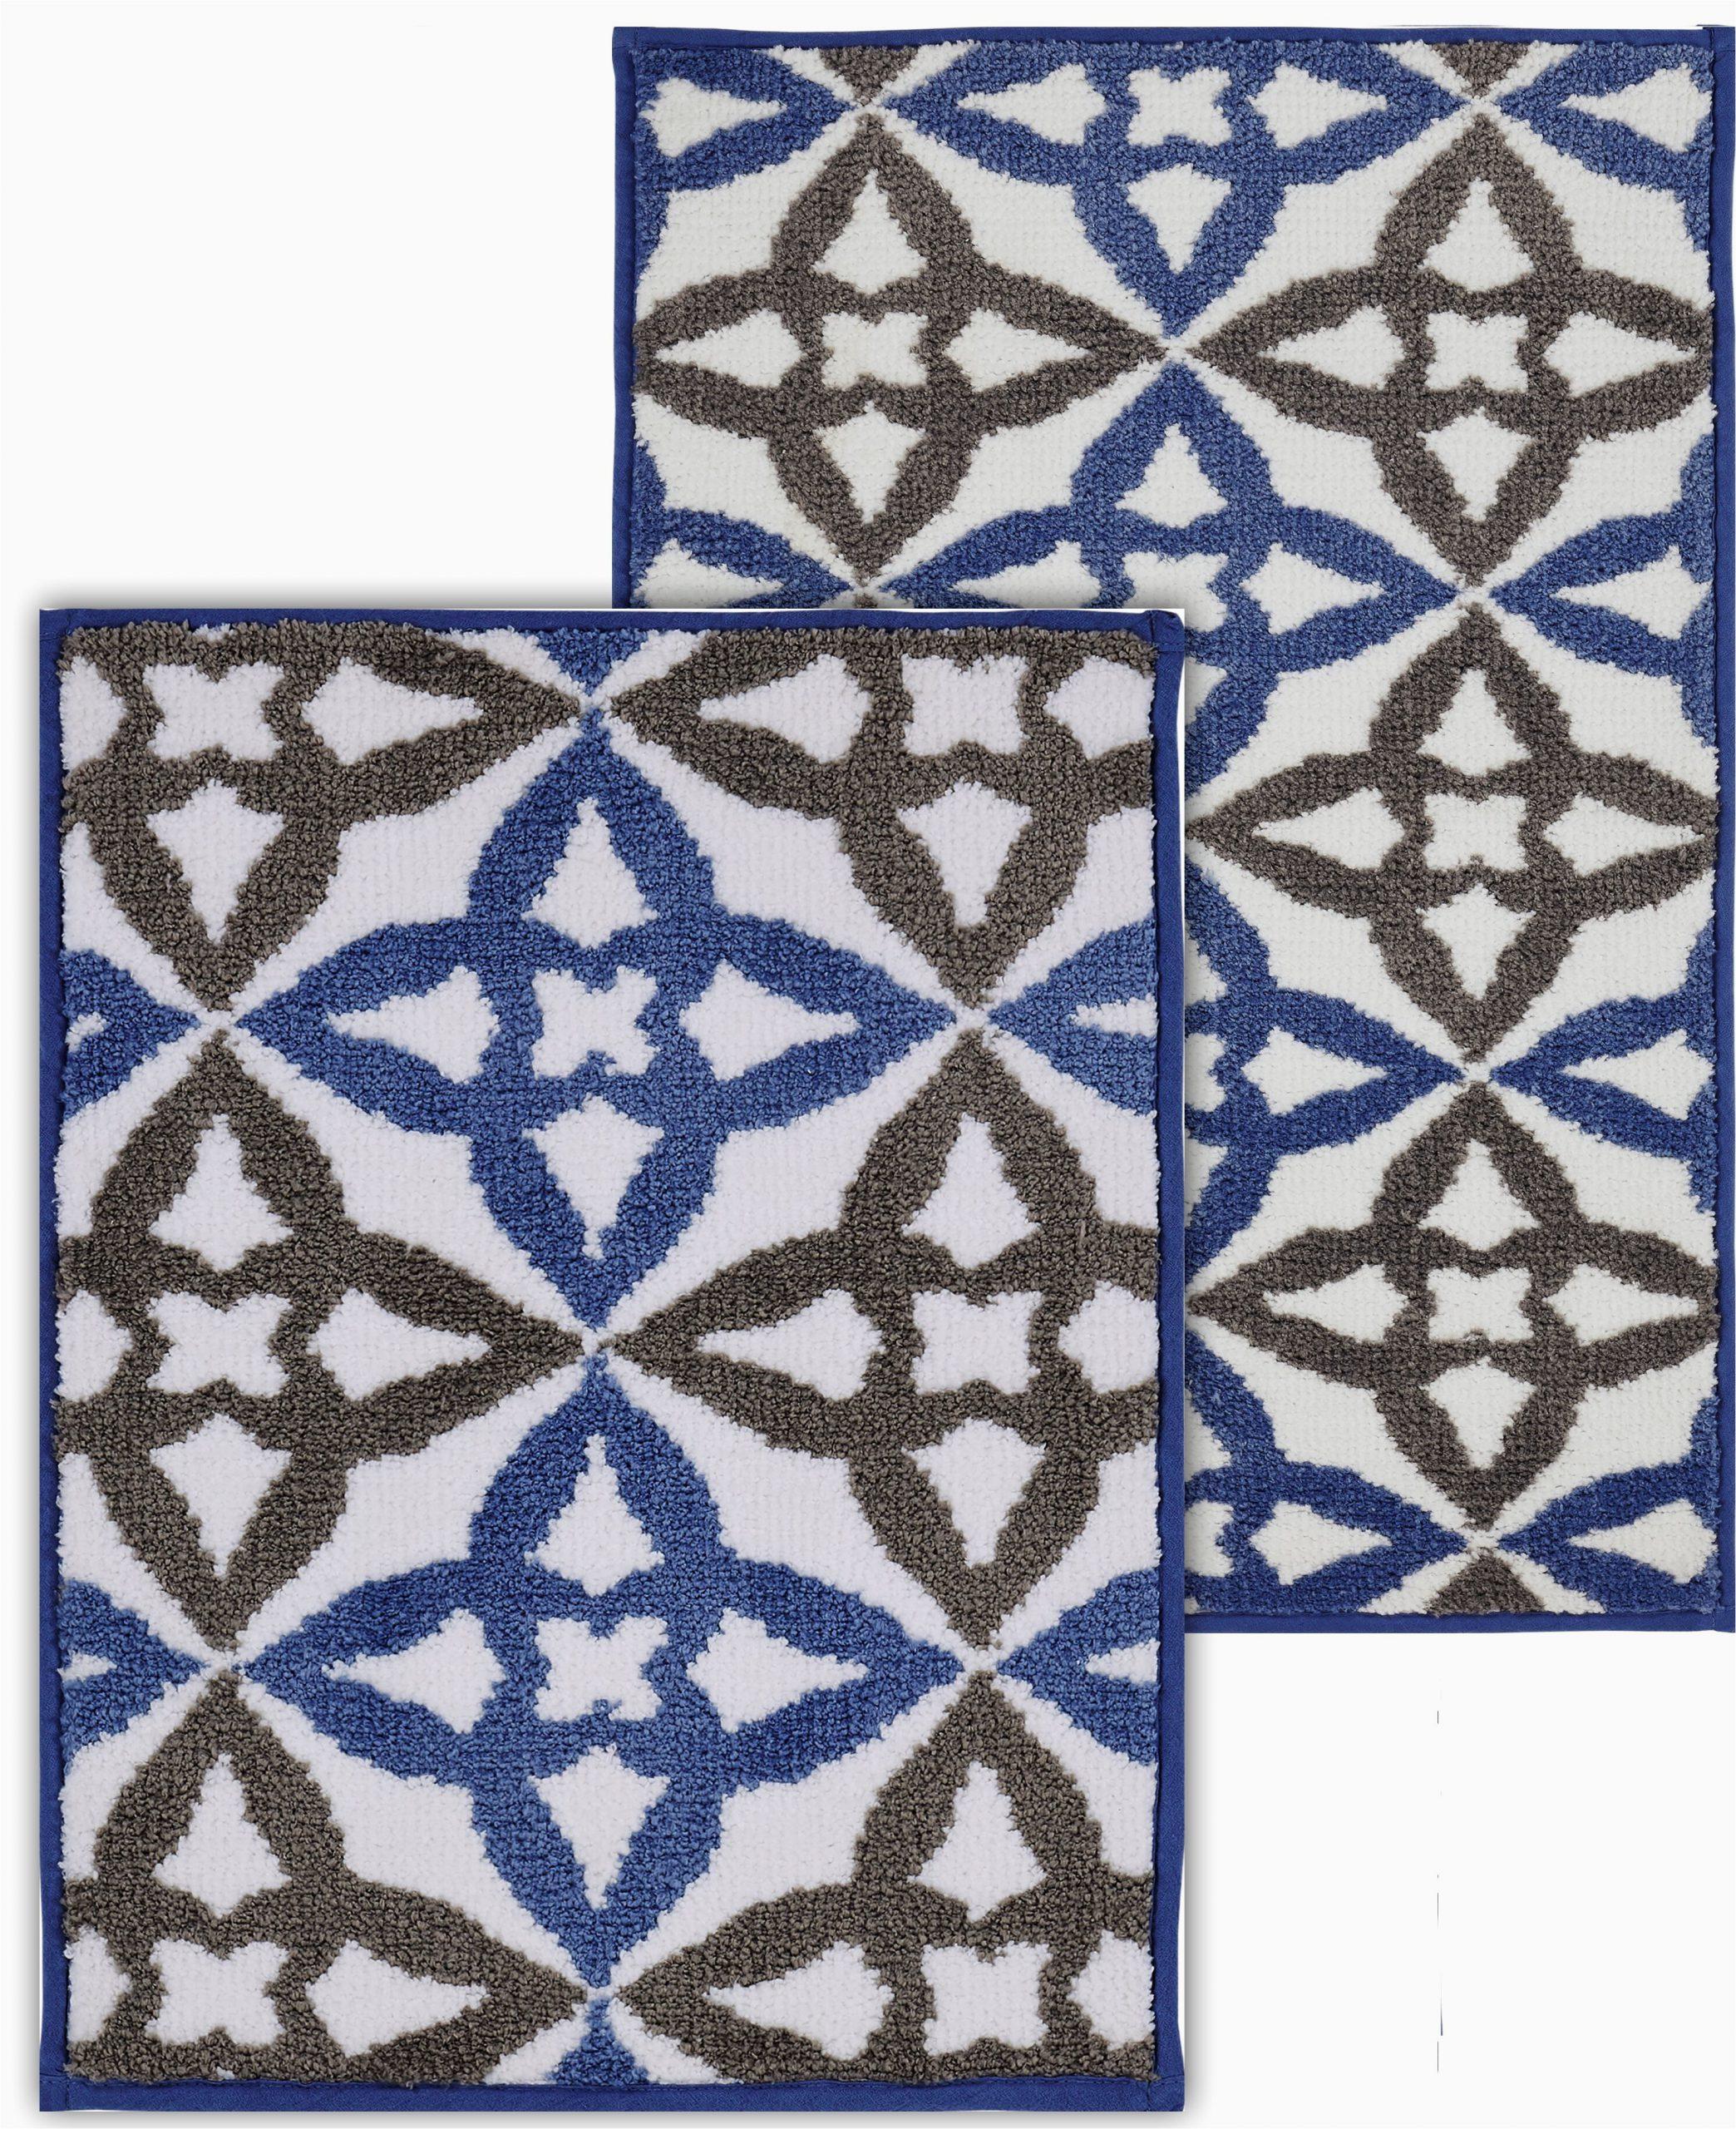 darby home co sandler rectangle non slip floral 2 piece bath rug set w